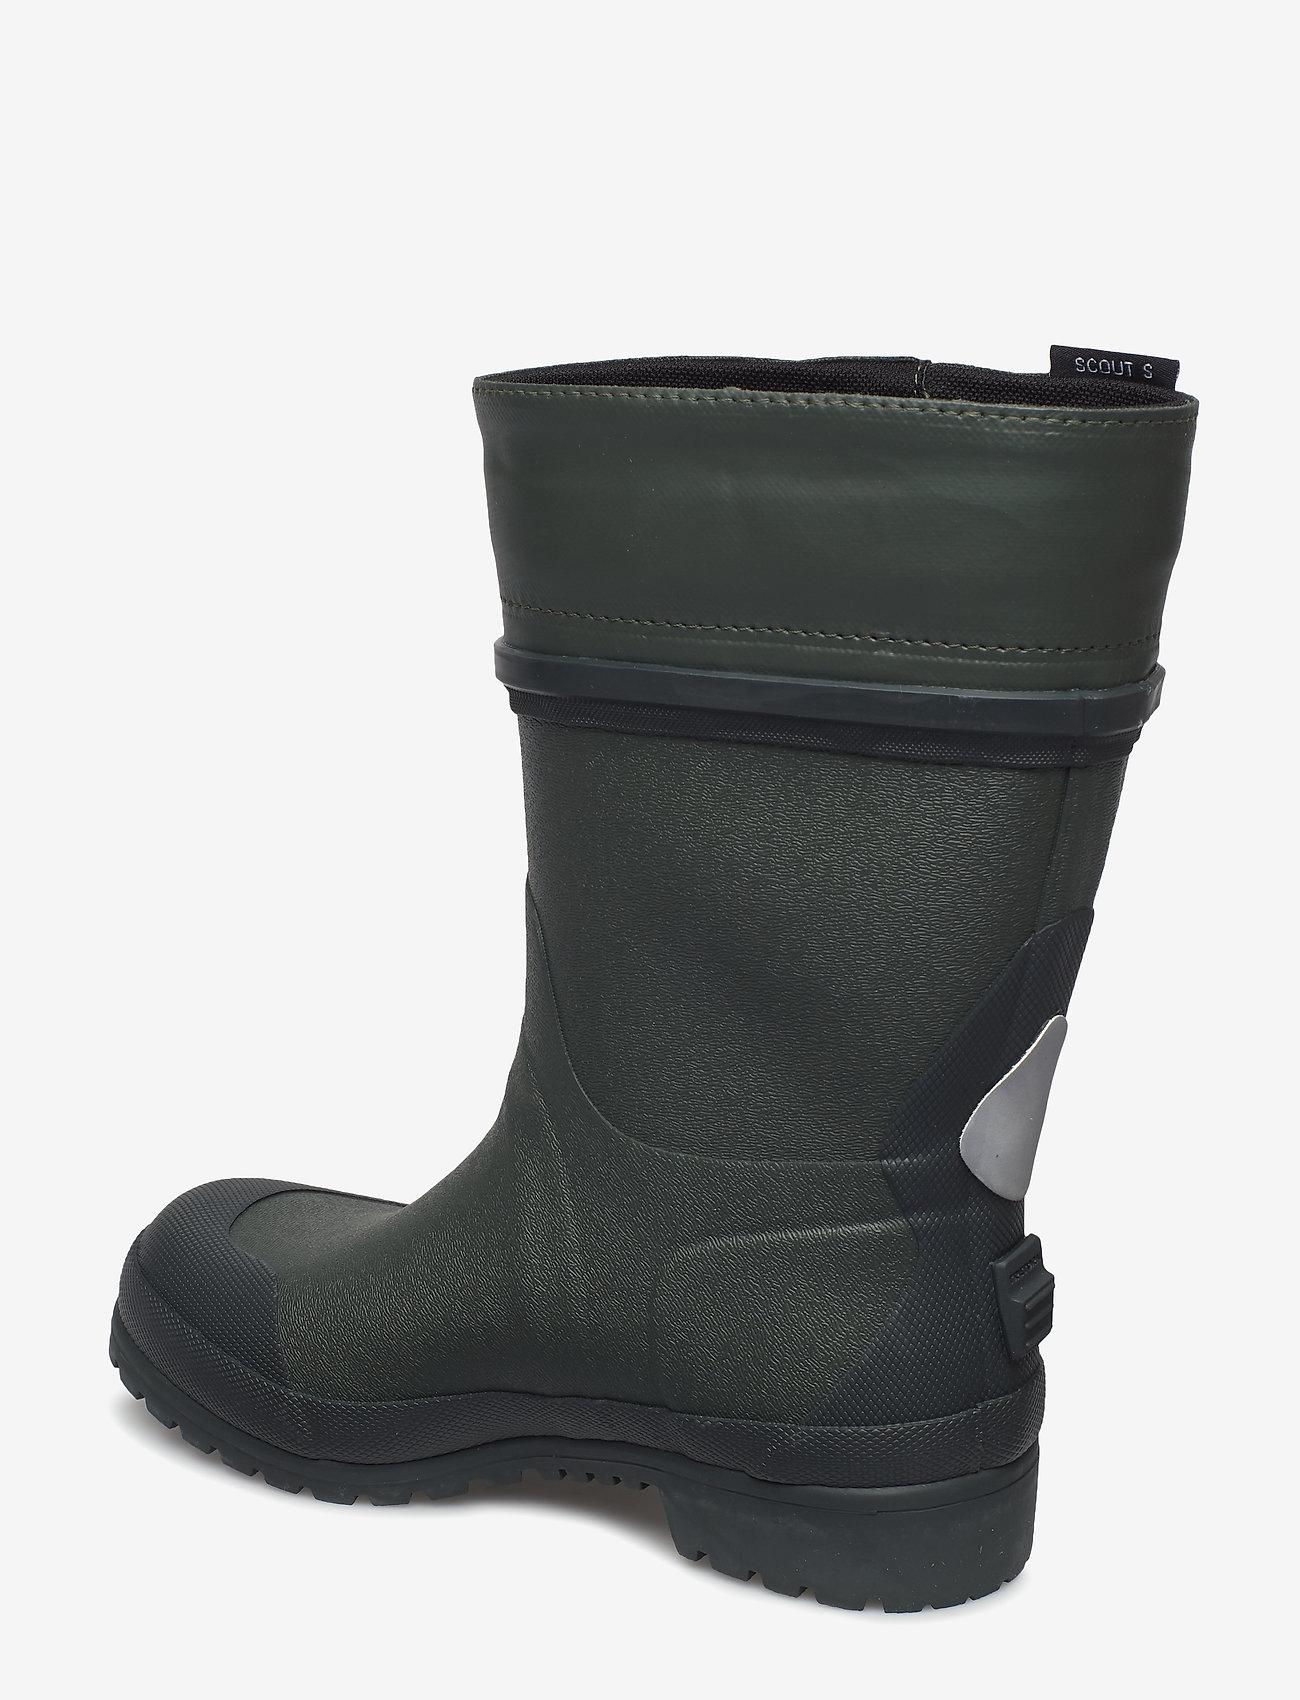 Scout S (Green) (80 €) - Tretorn h6P7Q